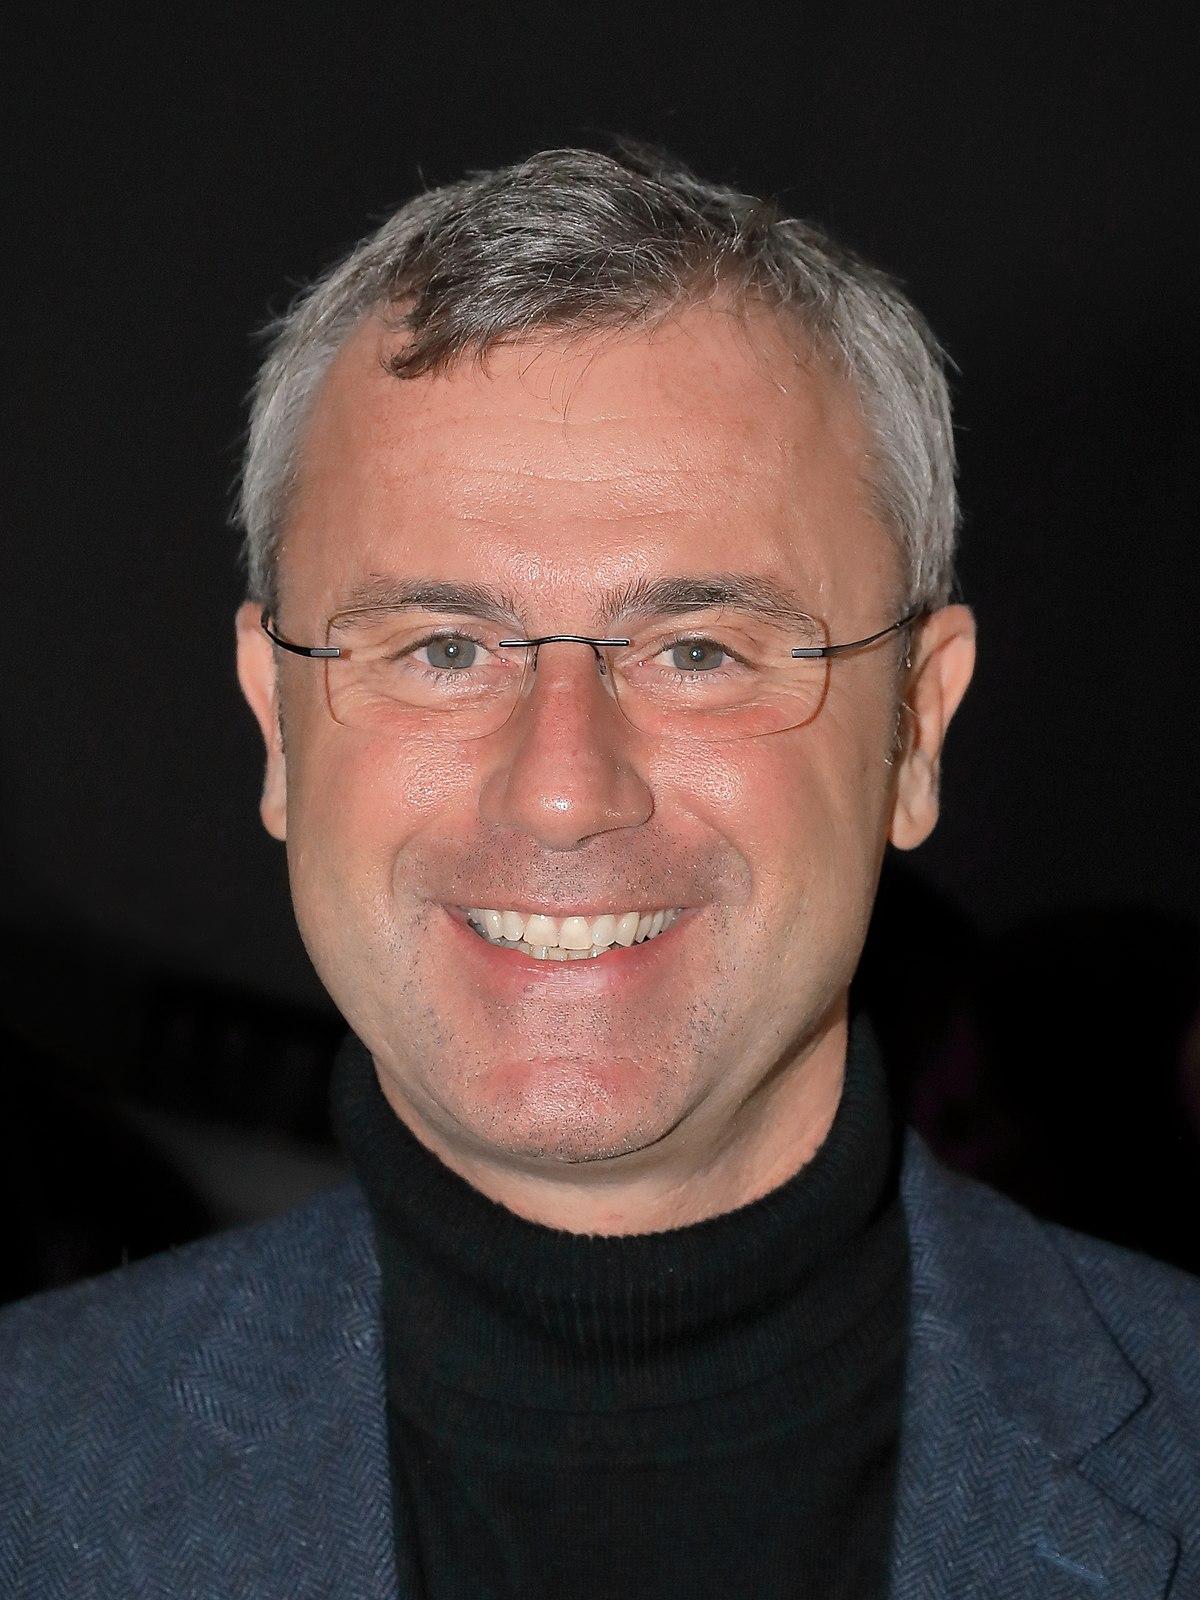 Nobert Hofer